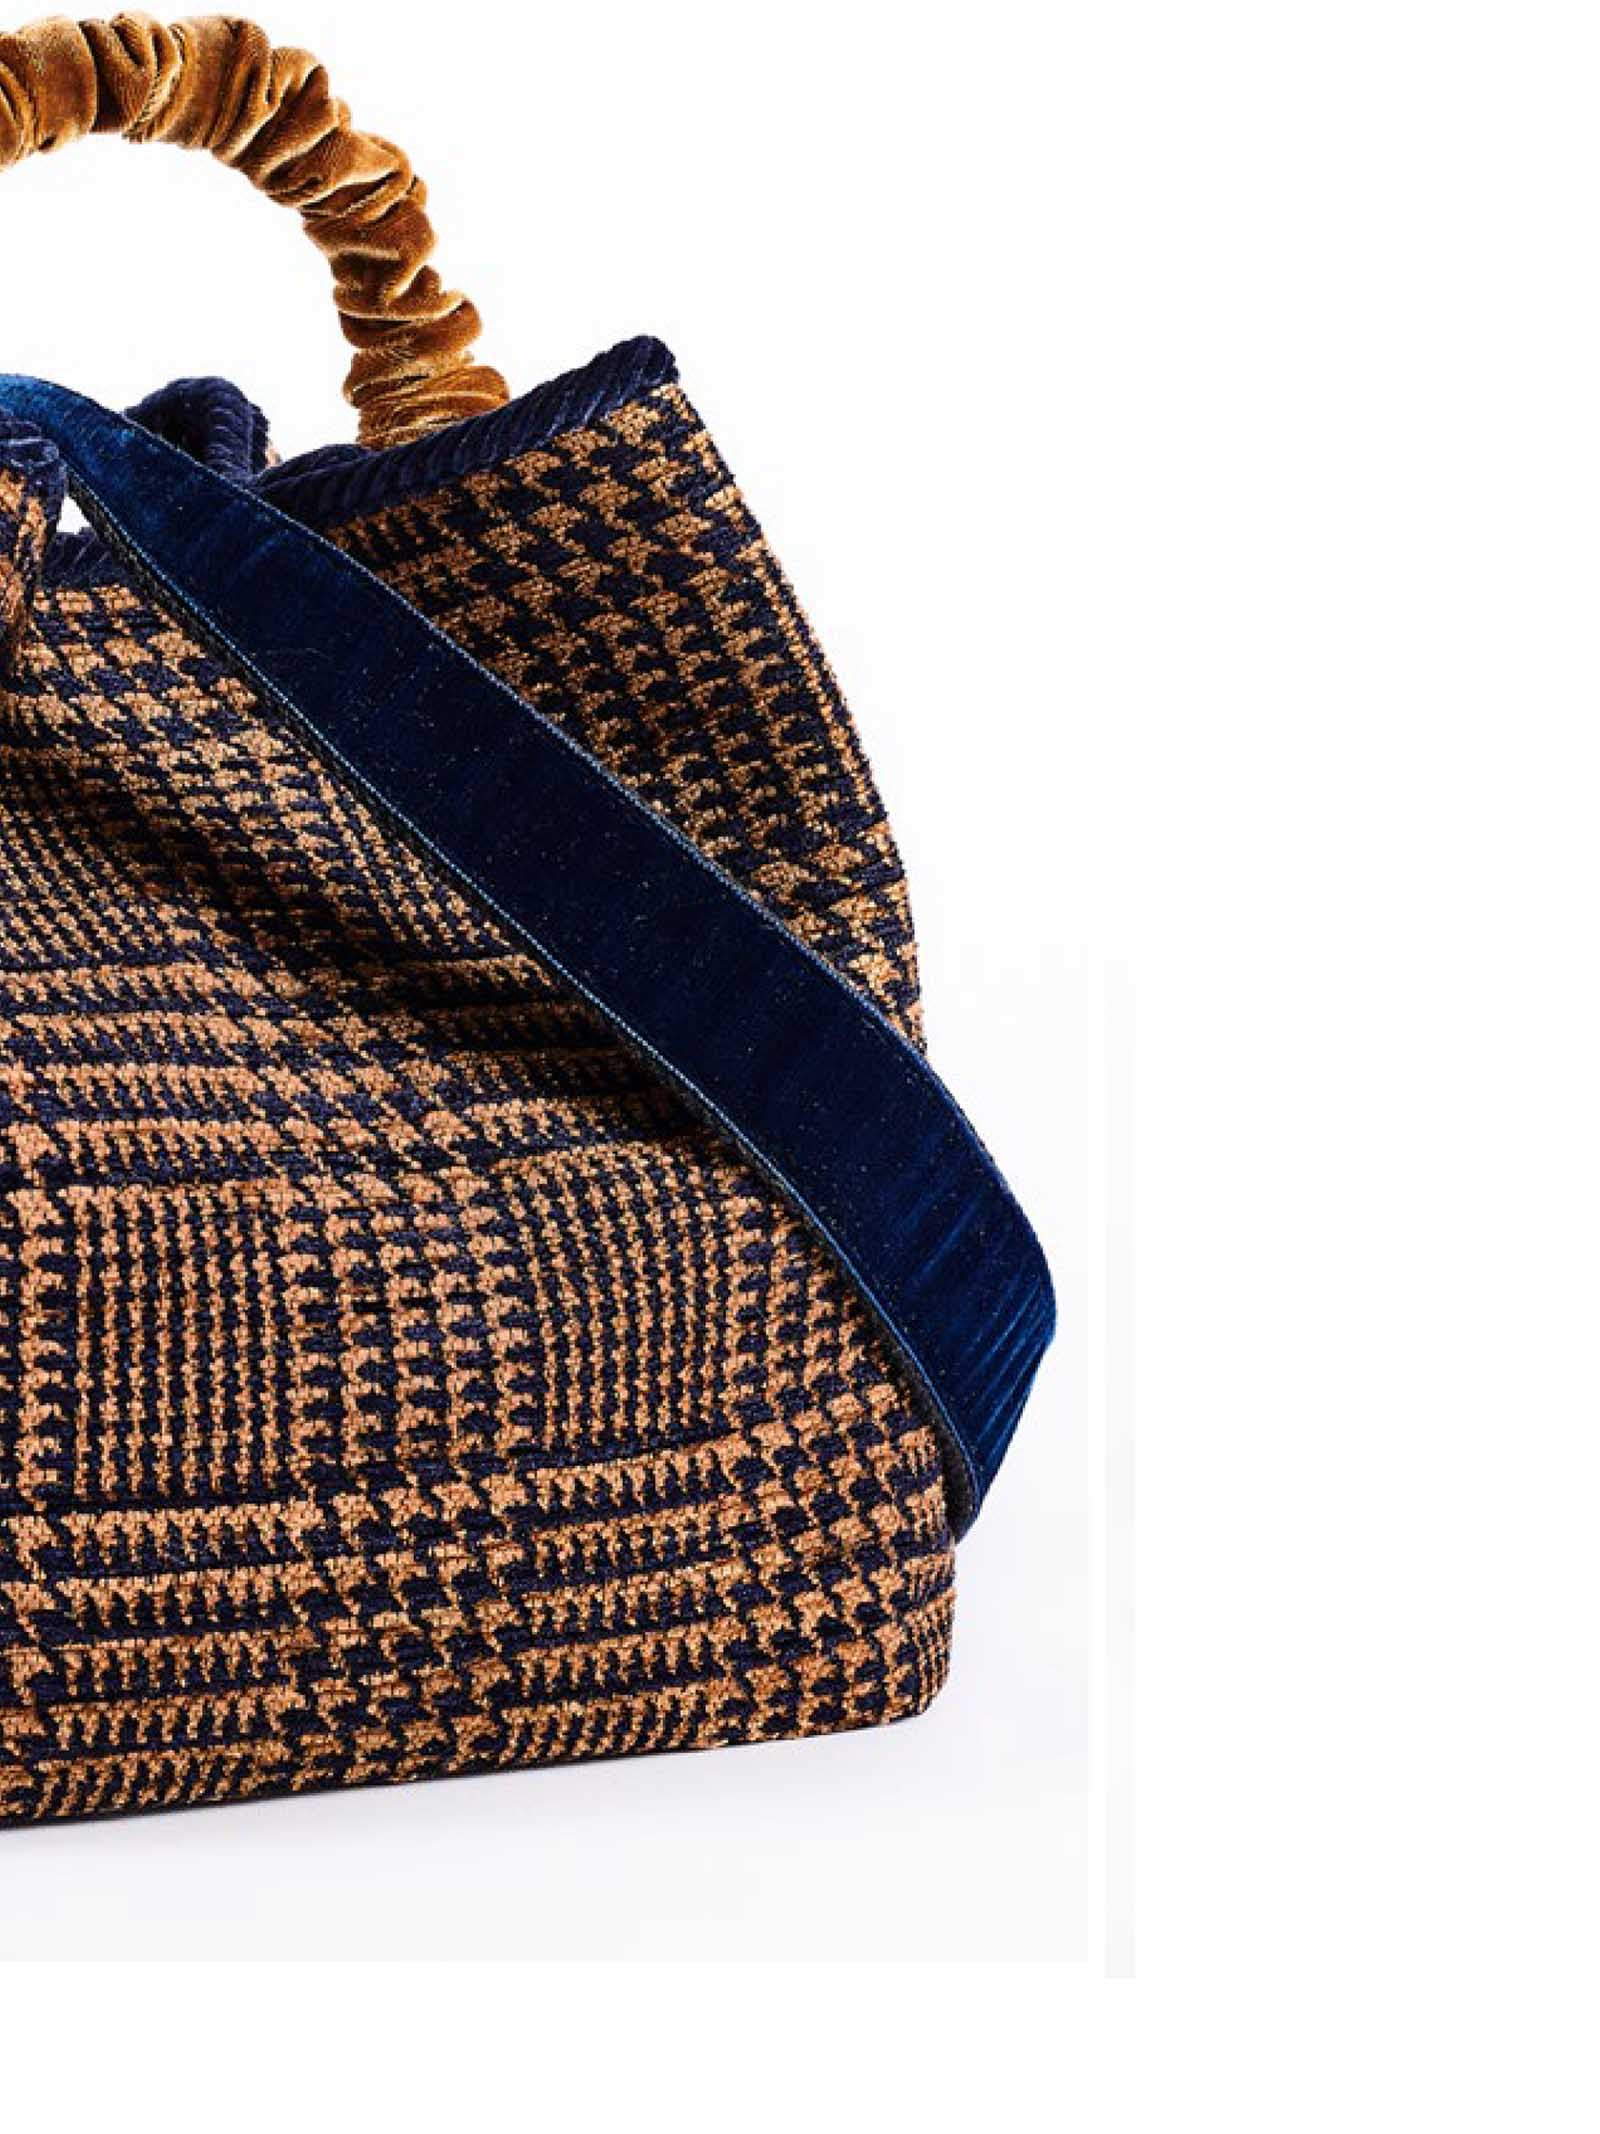 Women's Bucket Bag Zermat Madras in Jacquard Chenille with Velvet Handle and Fancy Shoulder Strap Via Mail Bag | Bags and backpacks | ZERMATM03